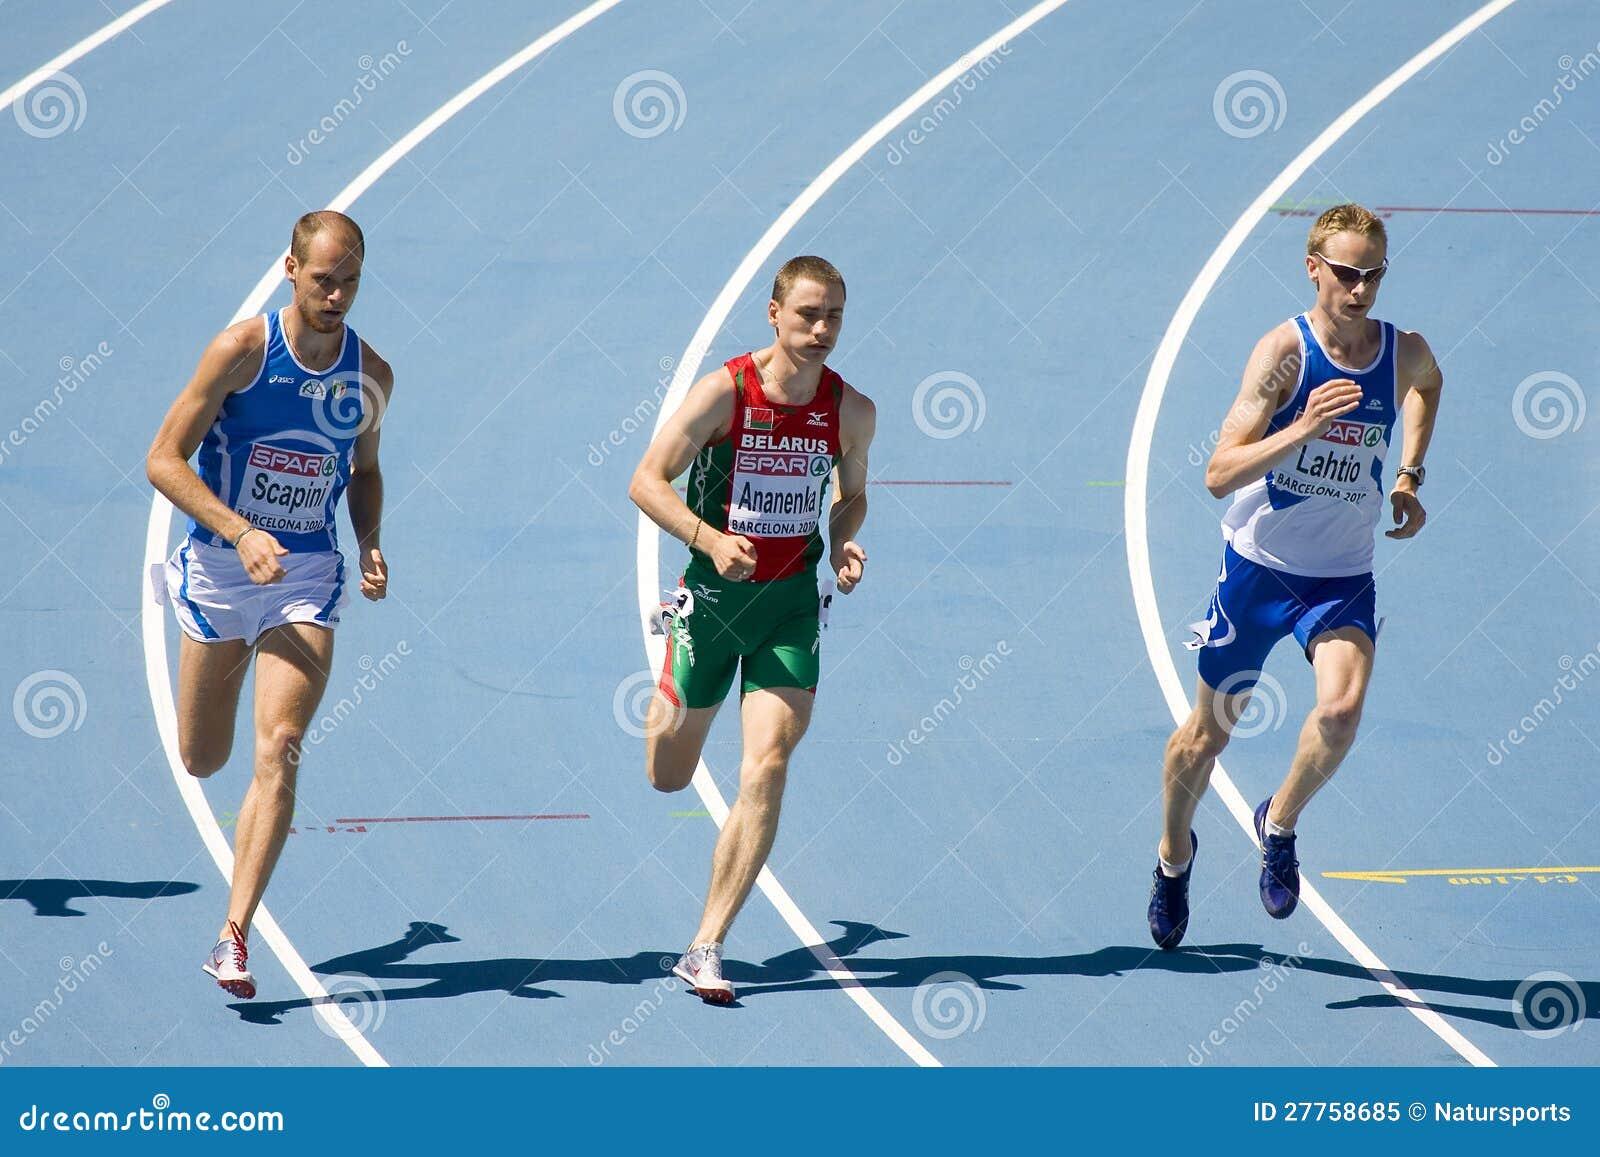 Athlétisme 800m